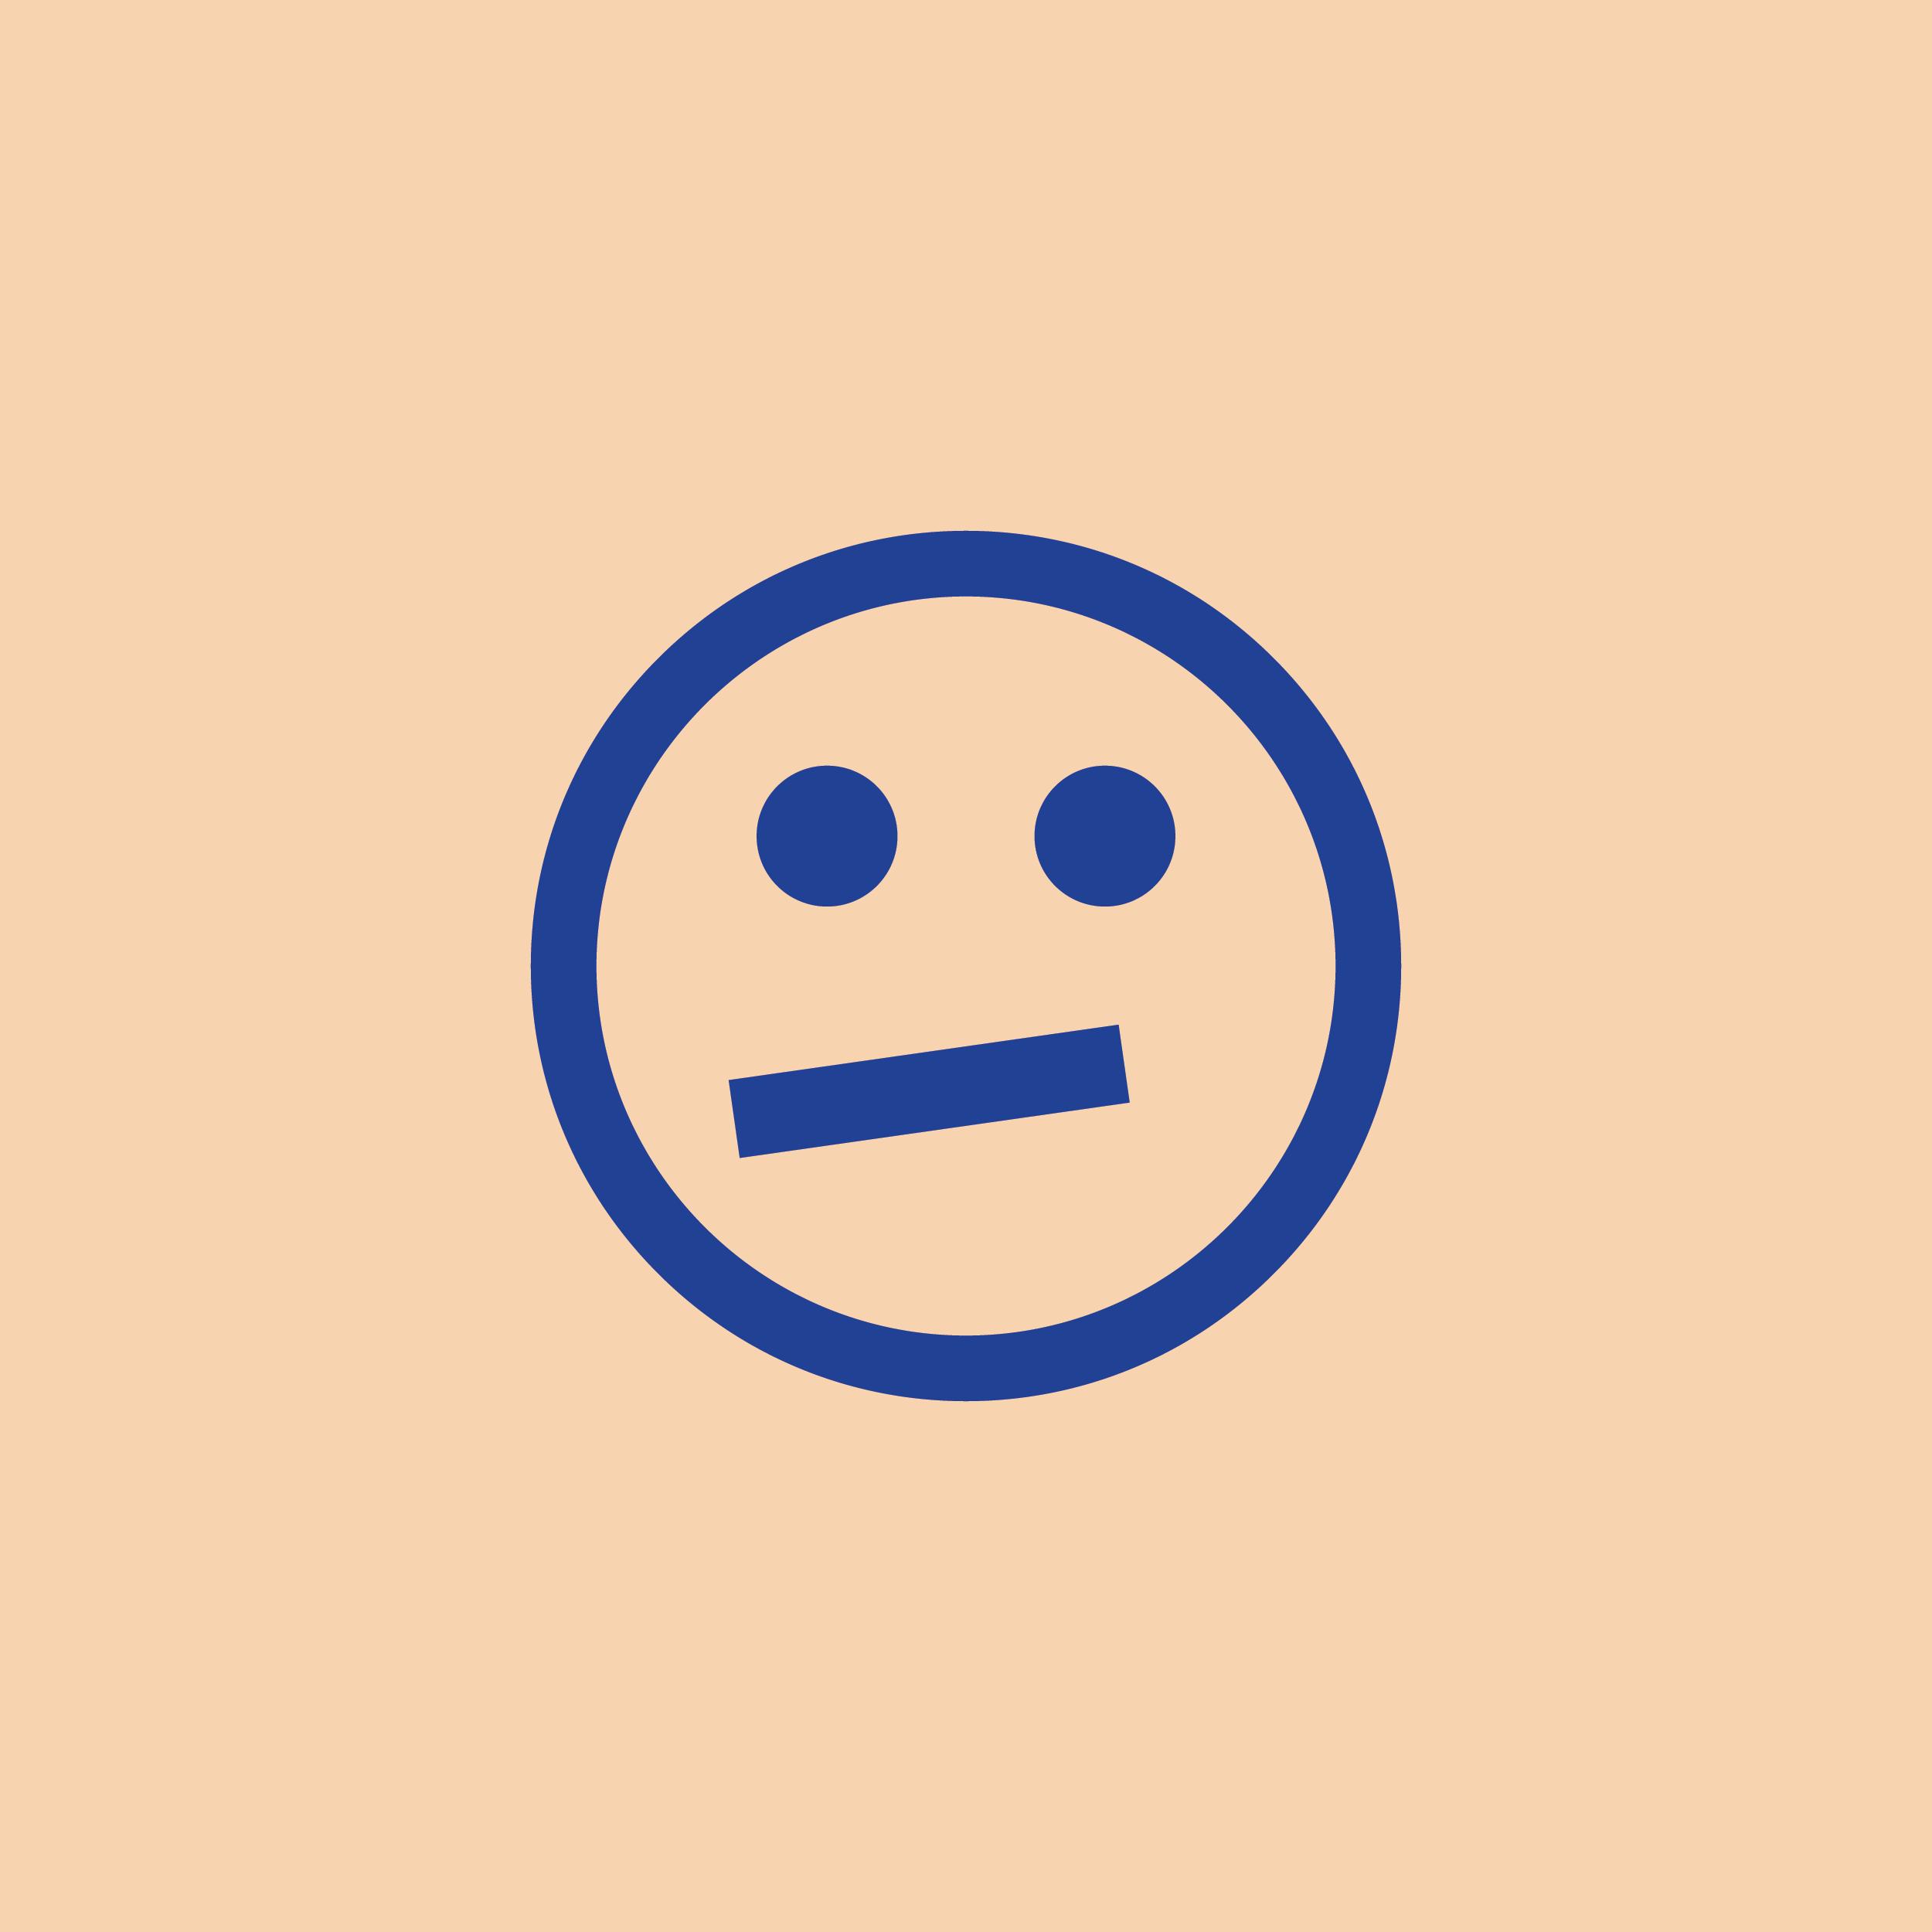 MCPMU_Smile_fSandBlue-01